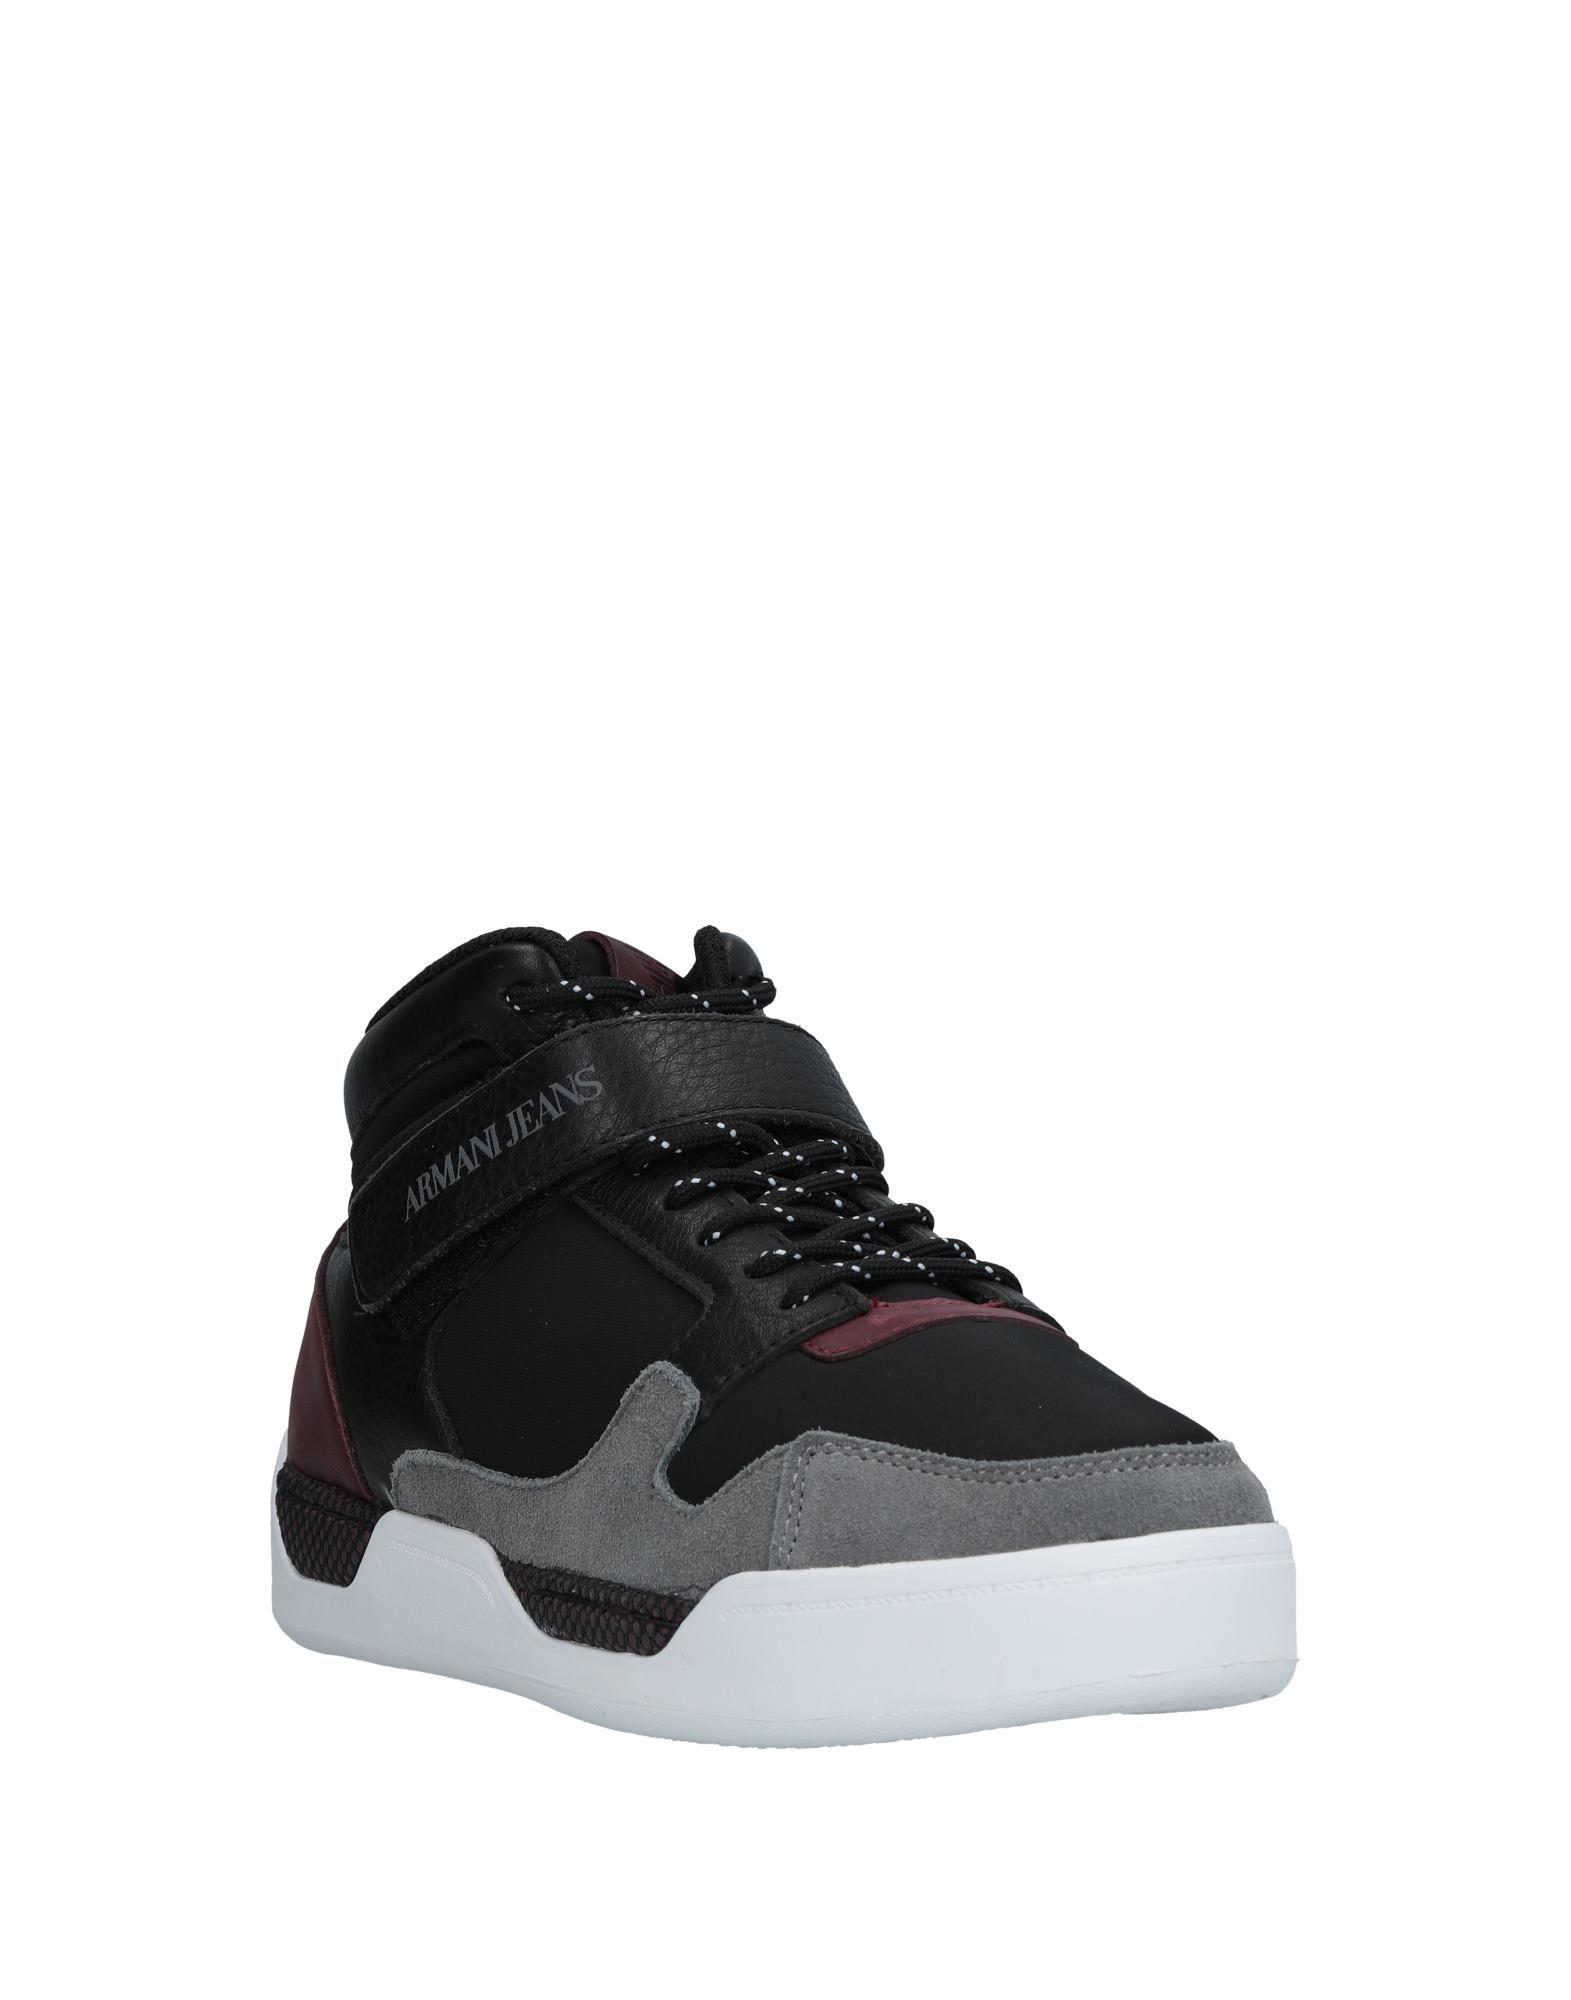 Armani Jeans Jeans Armani Sneakers Herren  11519528NH 3e9624